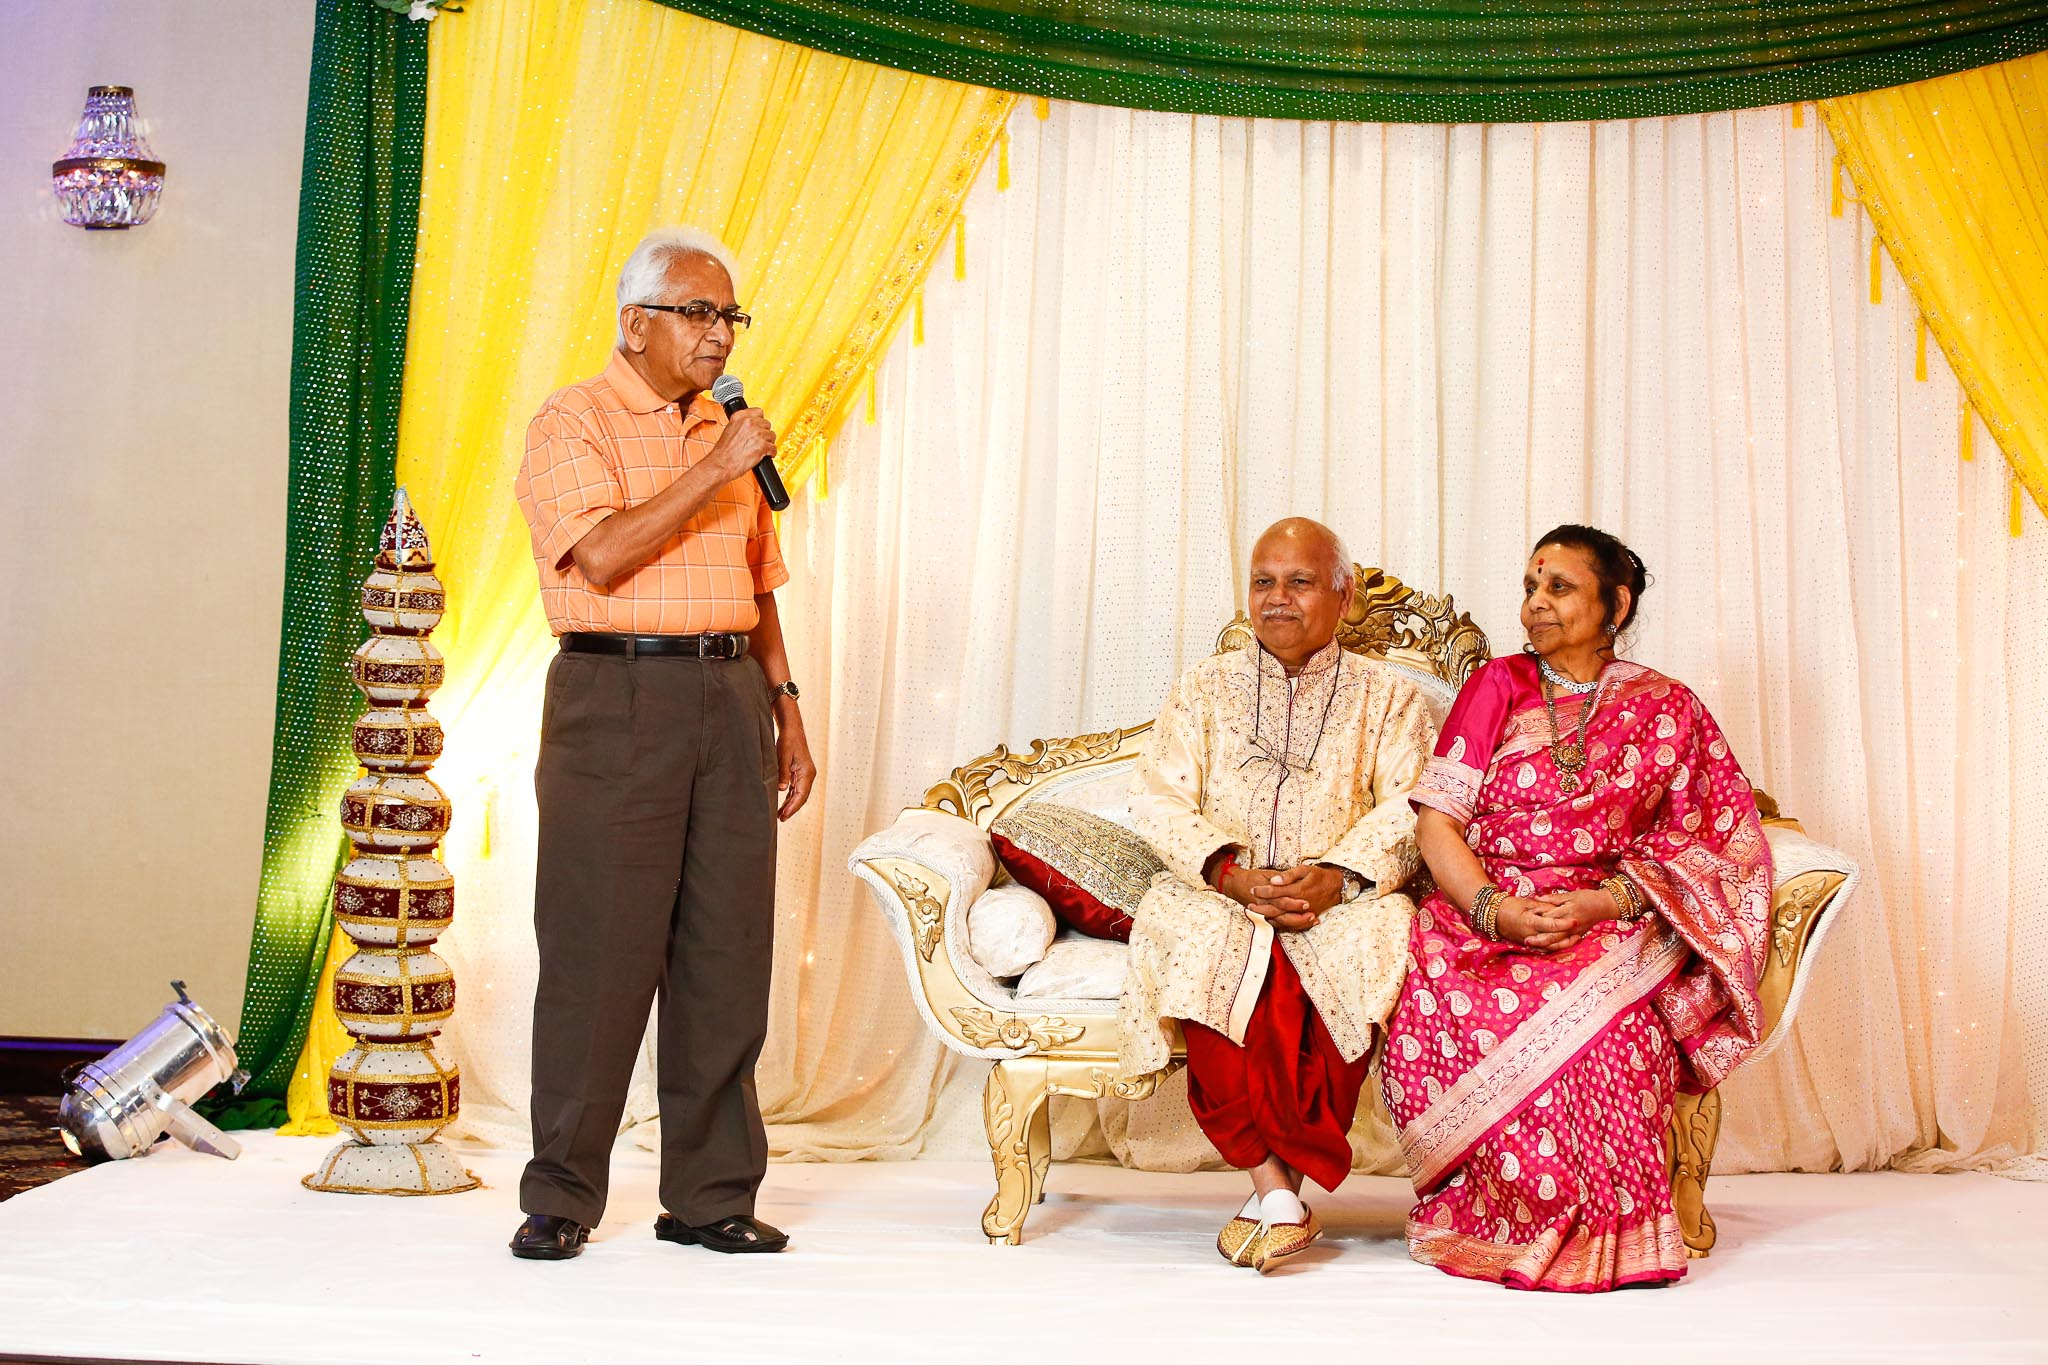 DC Indian wedding photographer,Wyndham Garden Exton Valley Forge wedding dc south asian wedding photographer, downington pennsylvania wedding indian photographer, downington pennsylvania wedding, (8 of 44).jpg